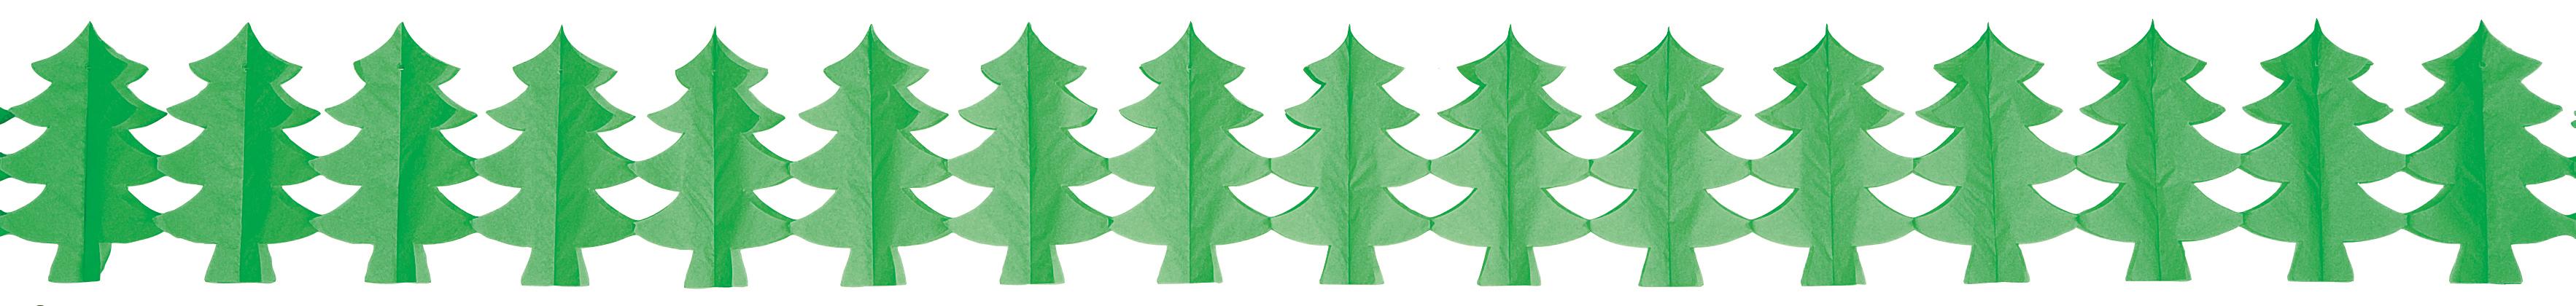 Décoration guirlande sapin vert en papier ignifugé